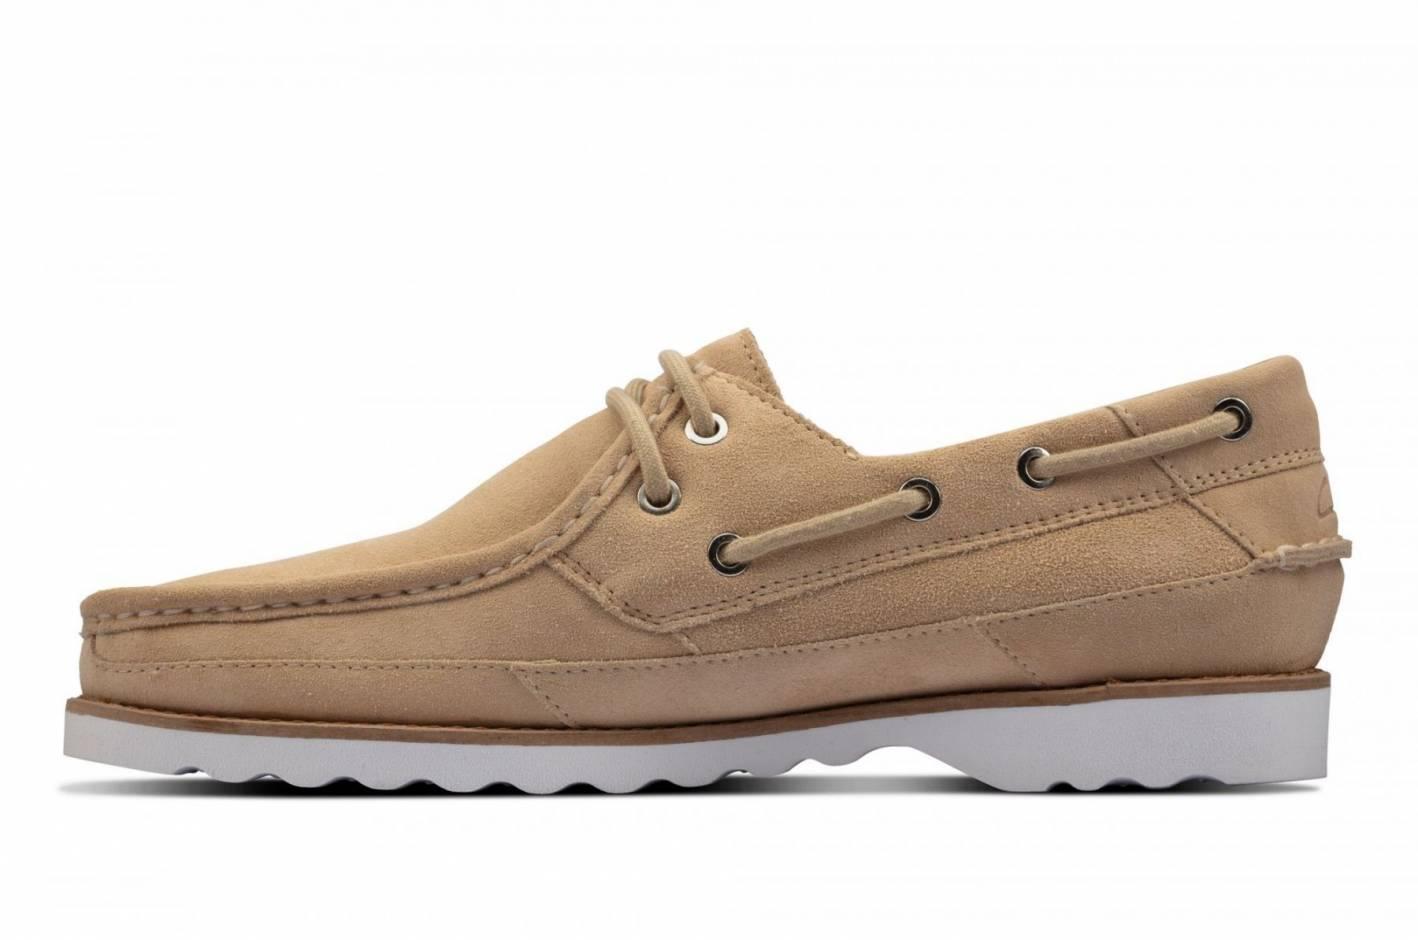 Clarks Durleigh Sail tan boat shoe